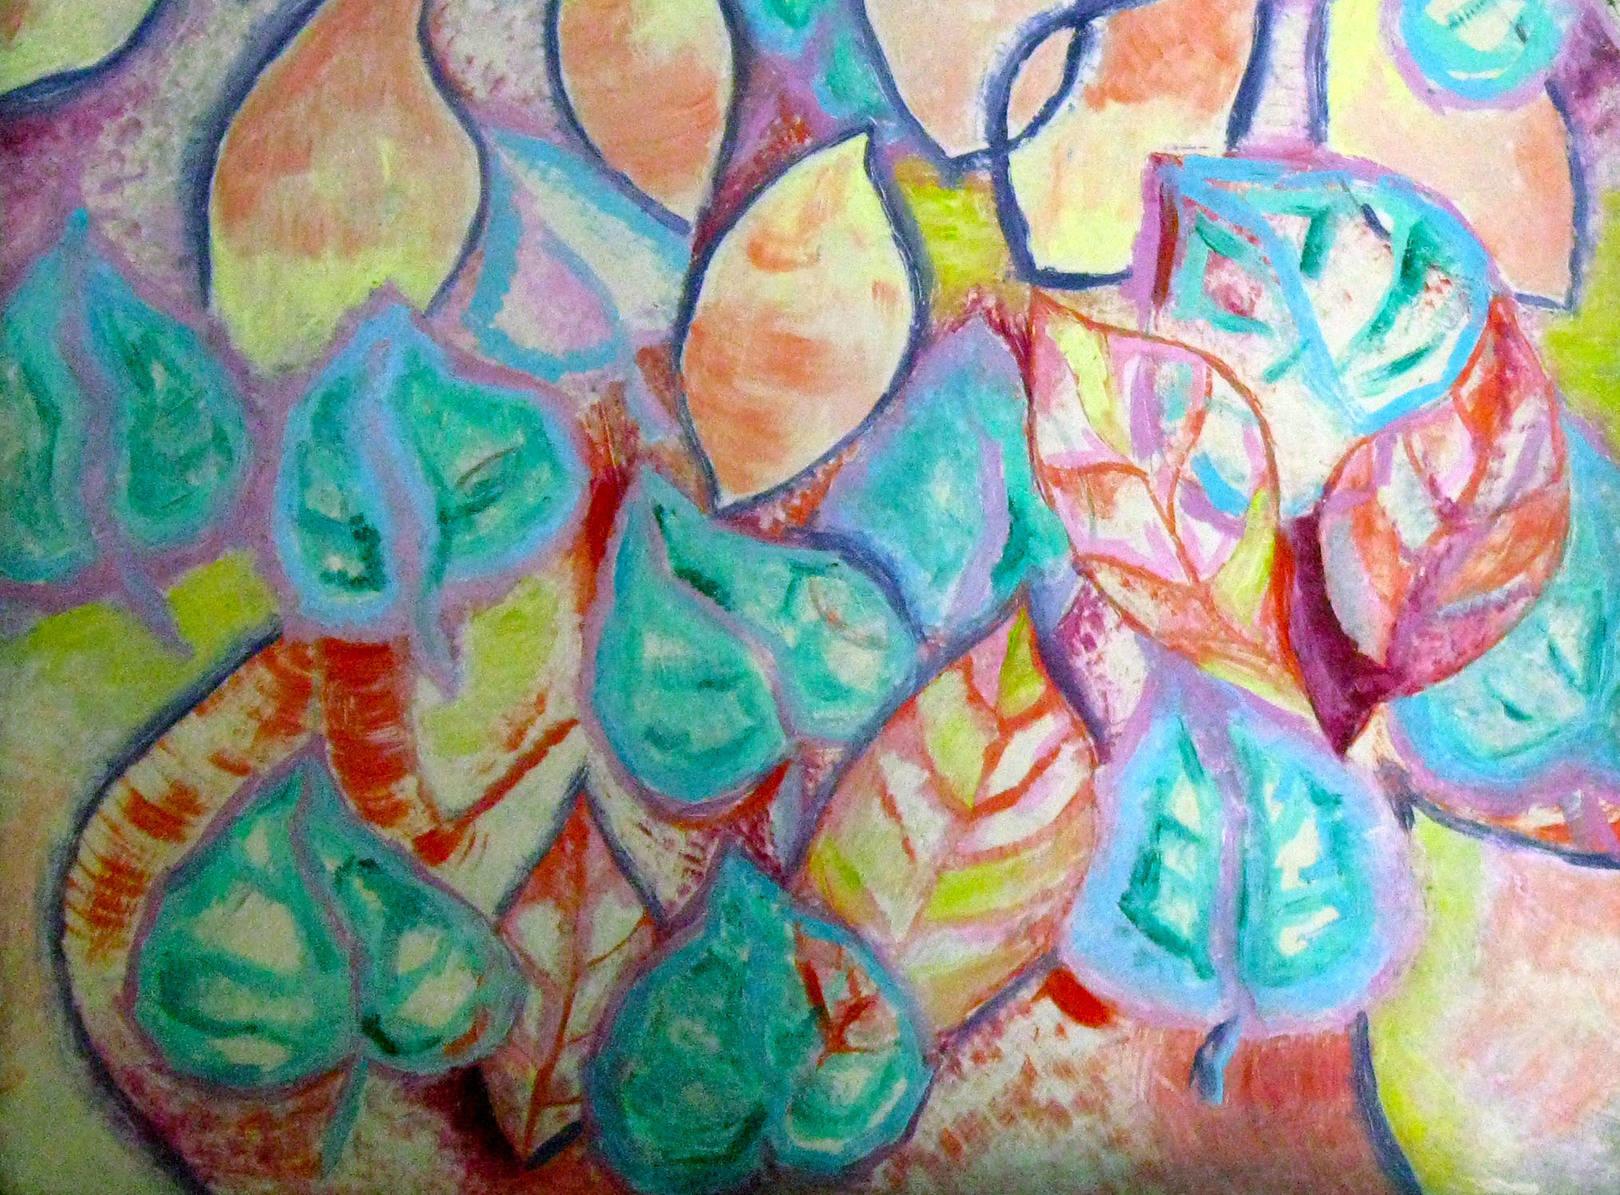 """Осенний листопад"" 2014 г. 36*49,5 см. масло, картон"